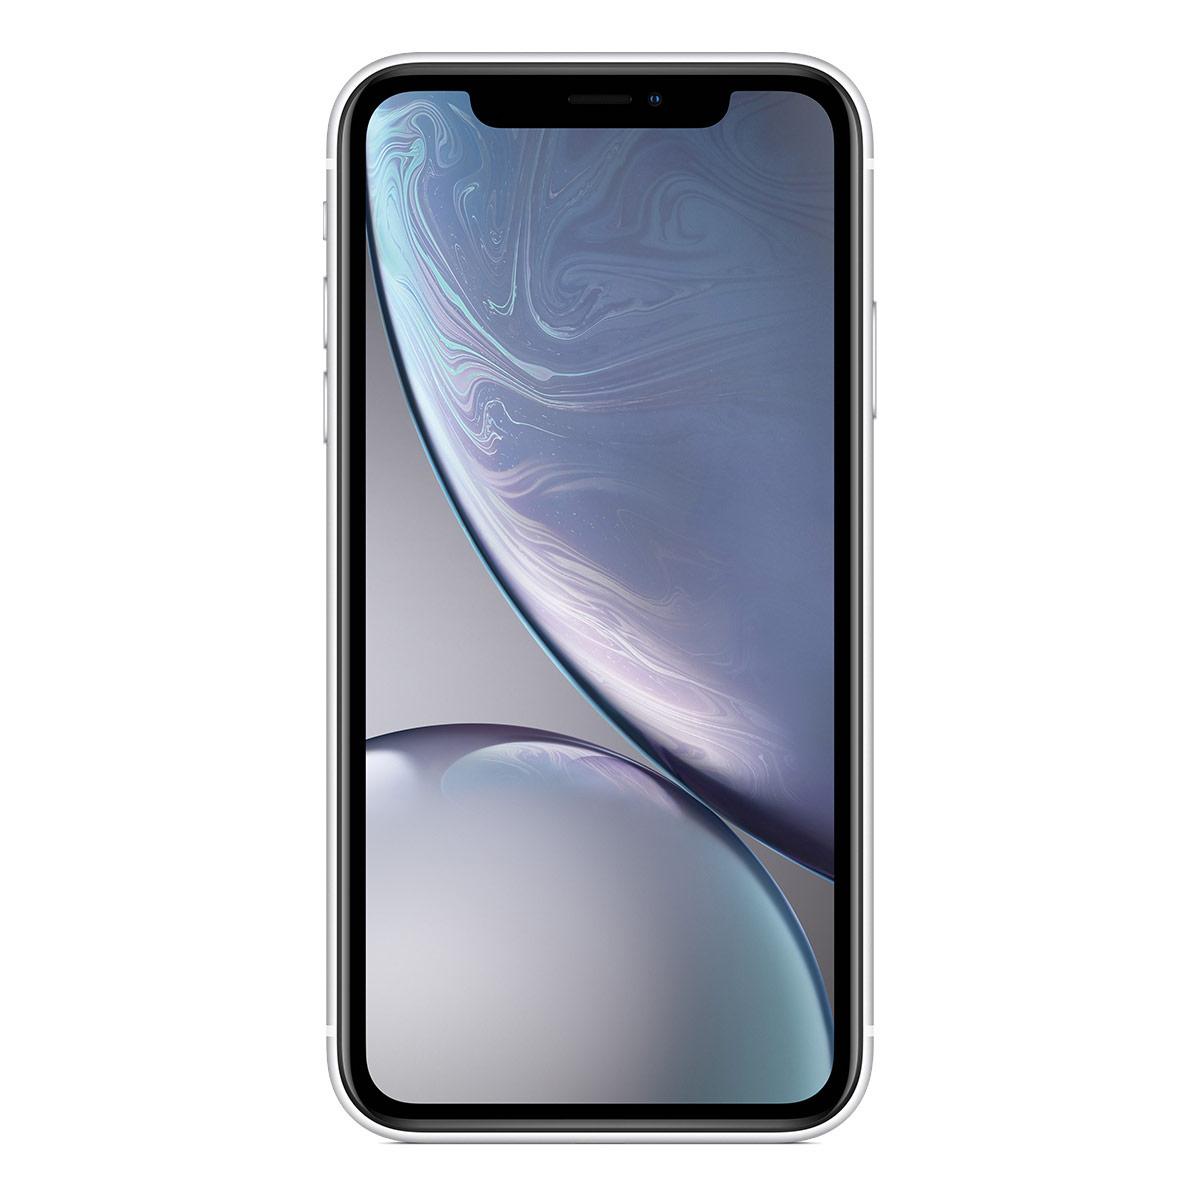 Apple iPhone XR 64GB White - Unlocked